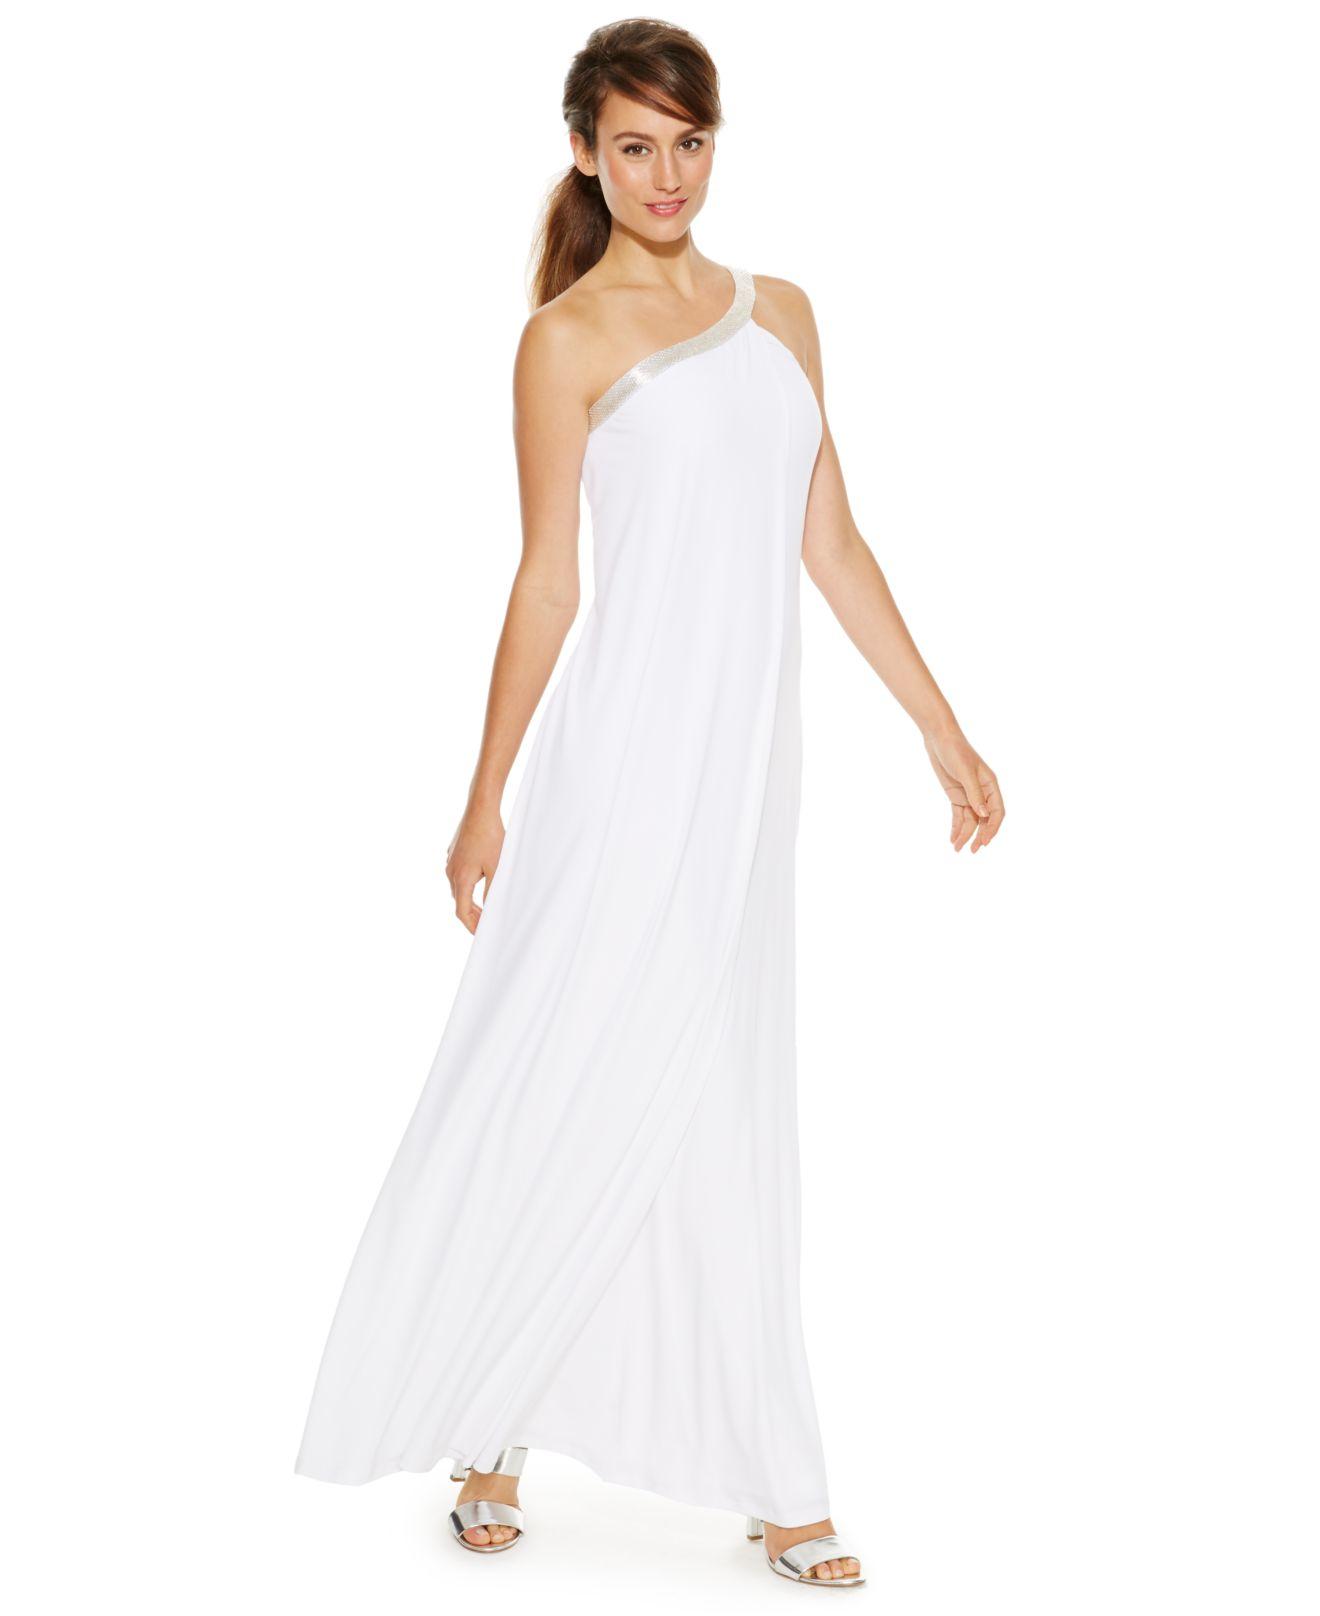 ead6694acf7cf White Long Dresses At Macys